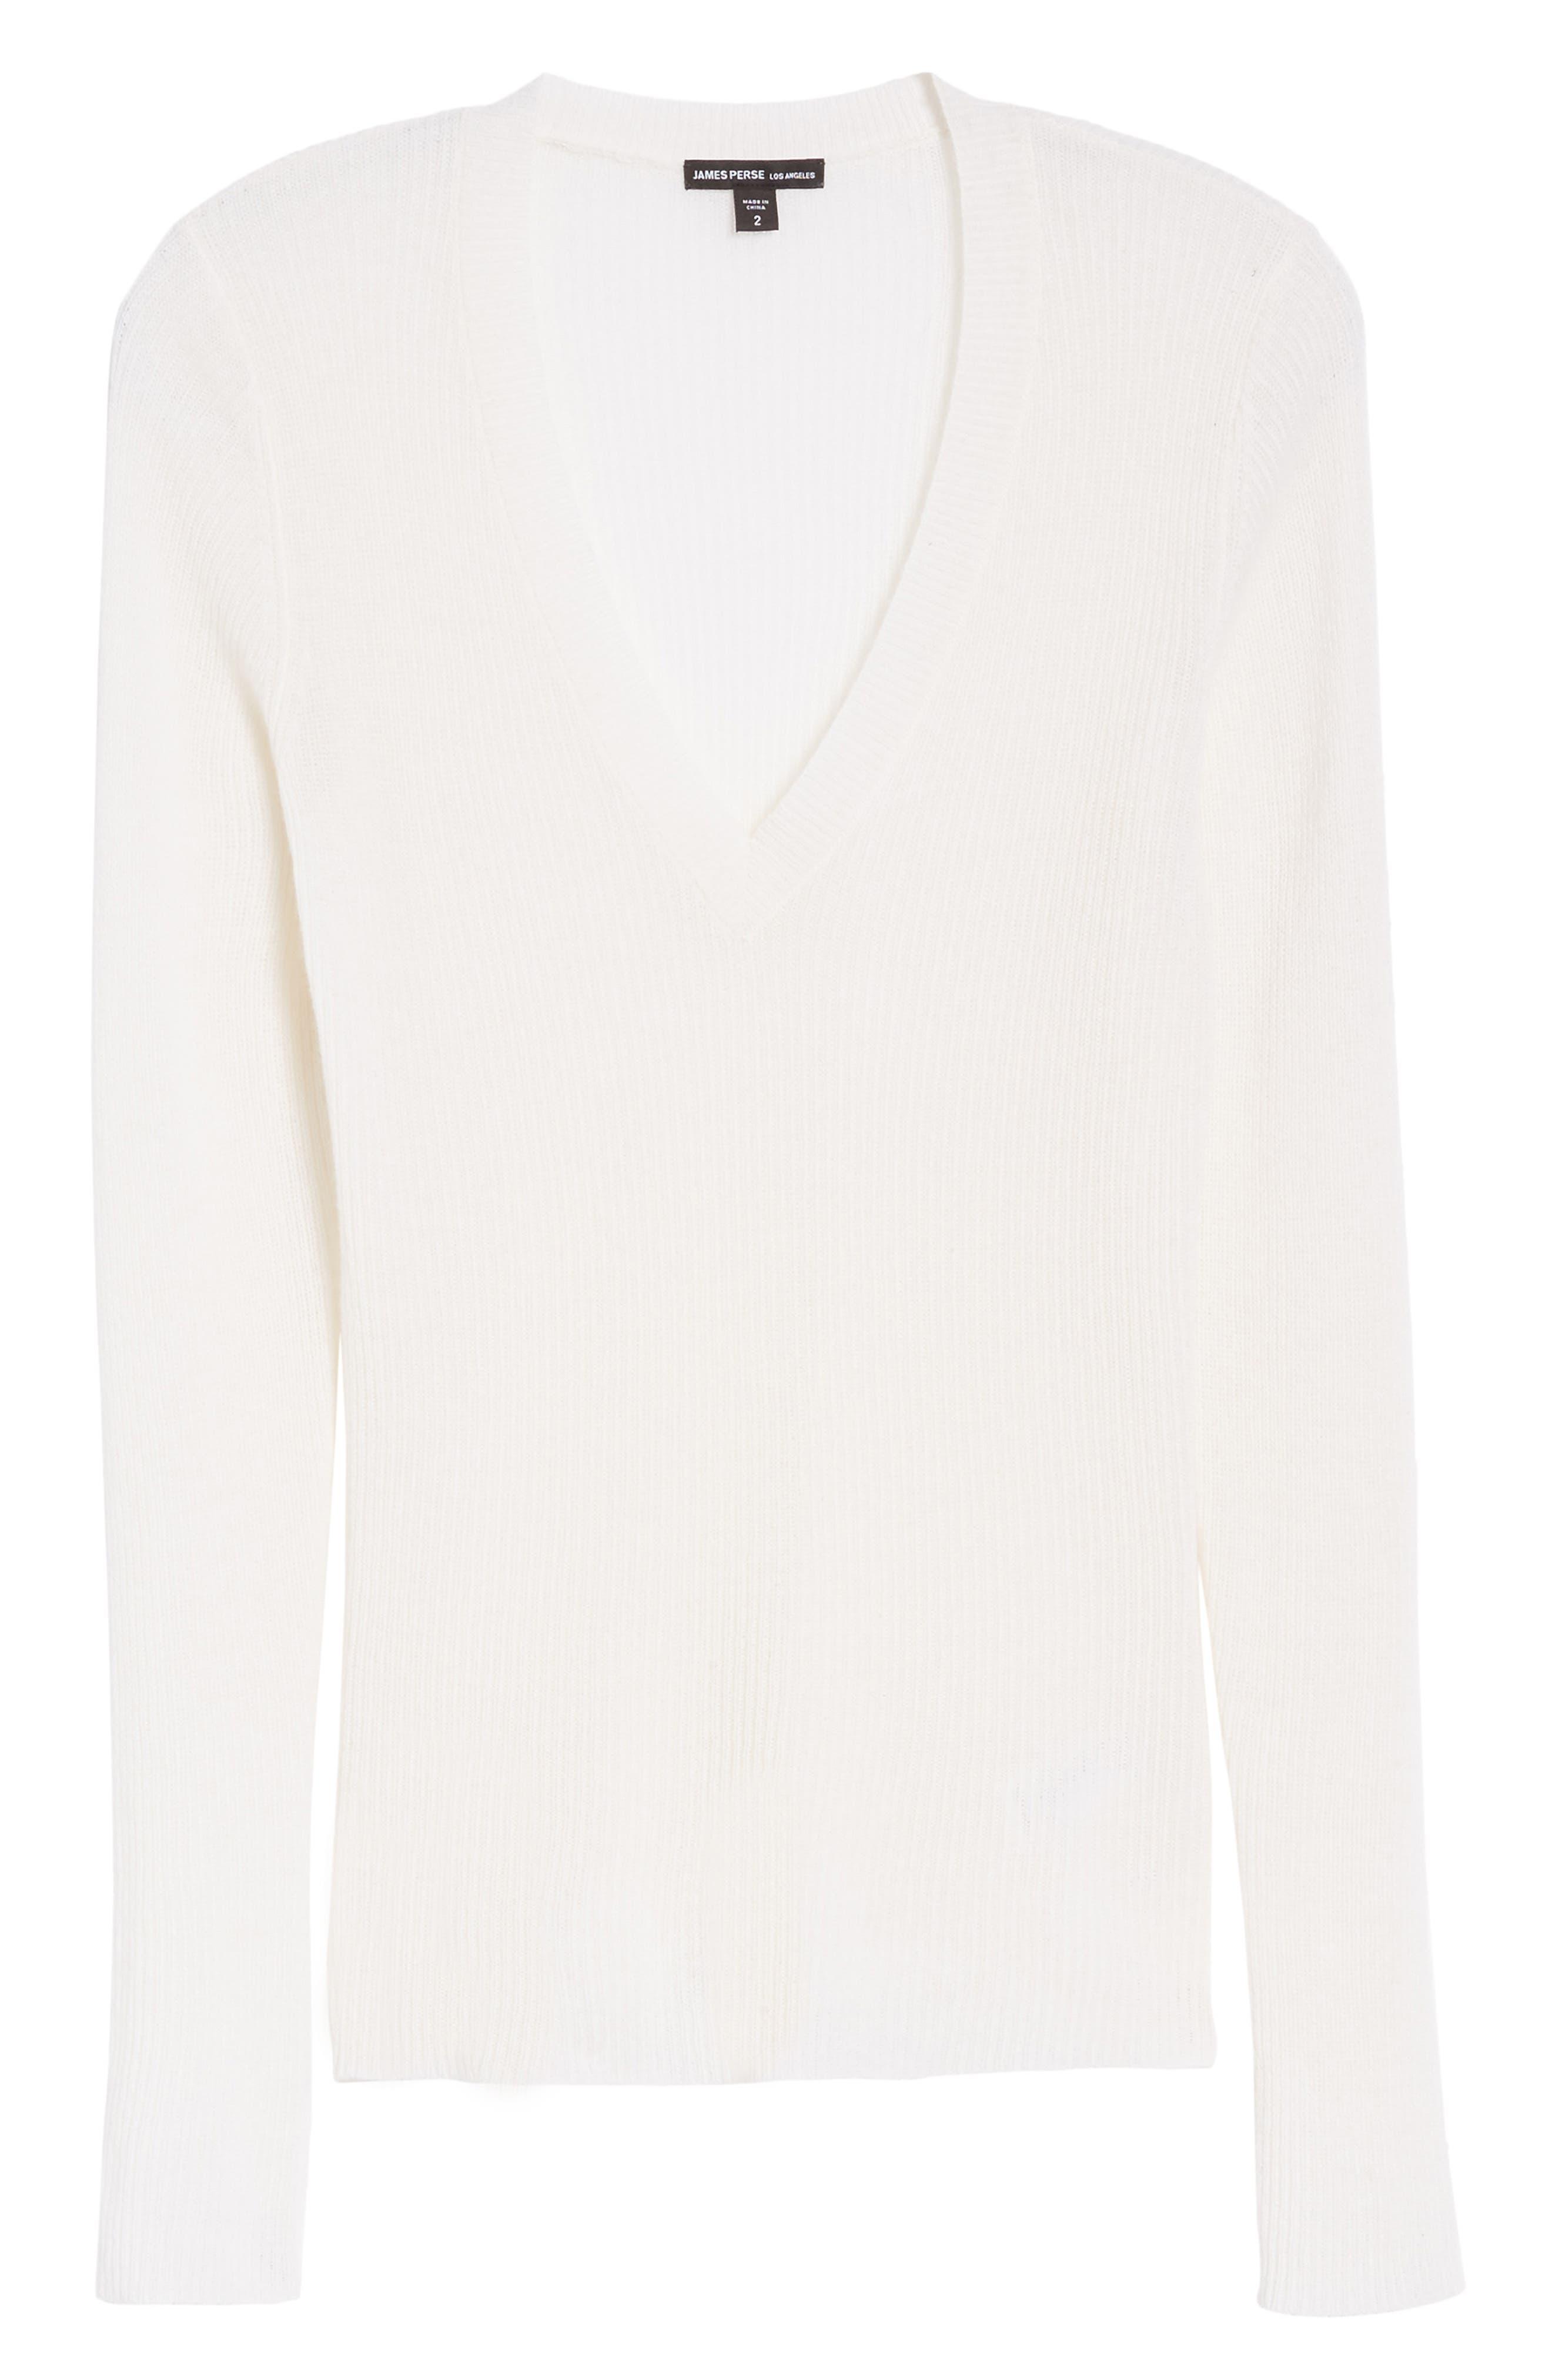 Cashmere V-Neck Sweater,                             Alternate thumbnail 6, color,                             100